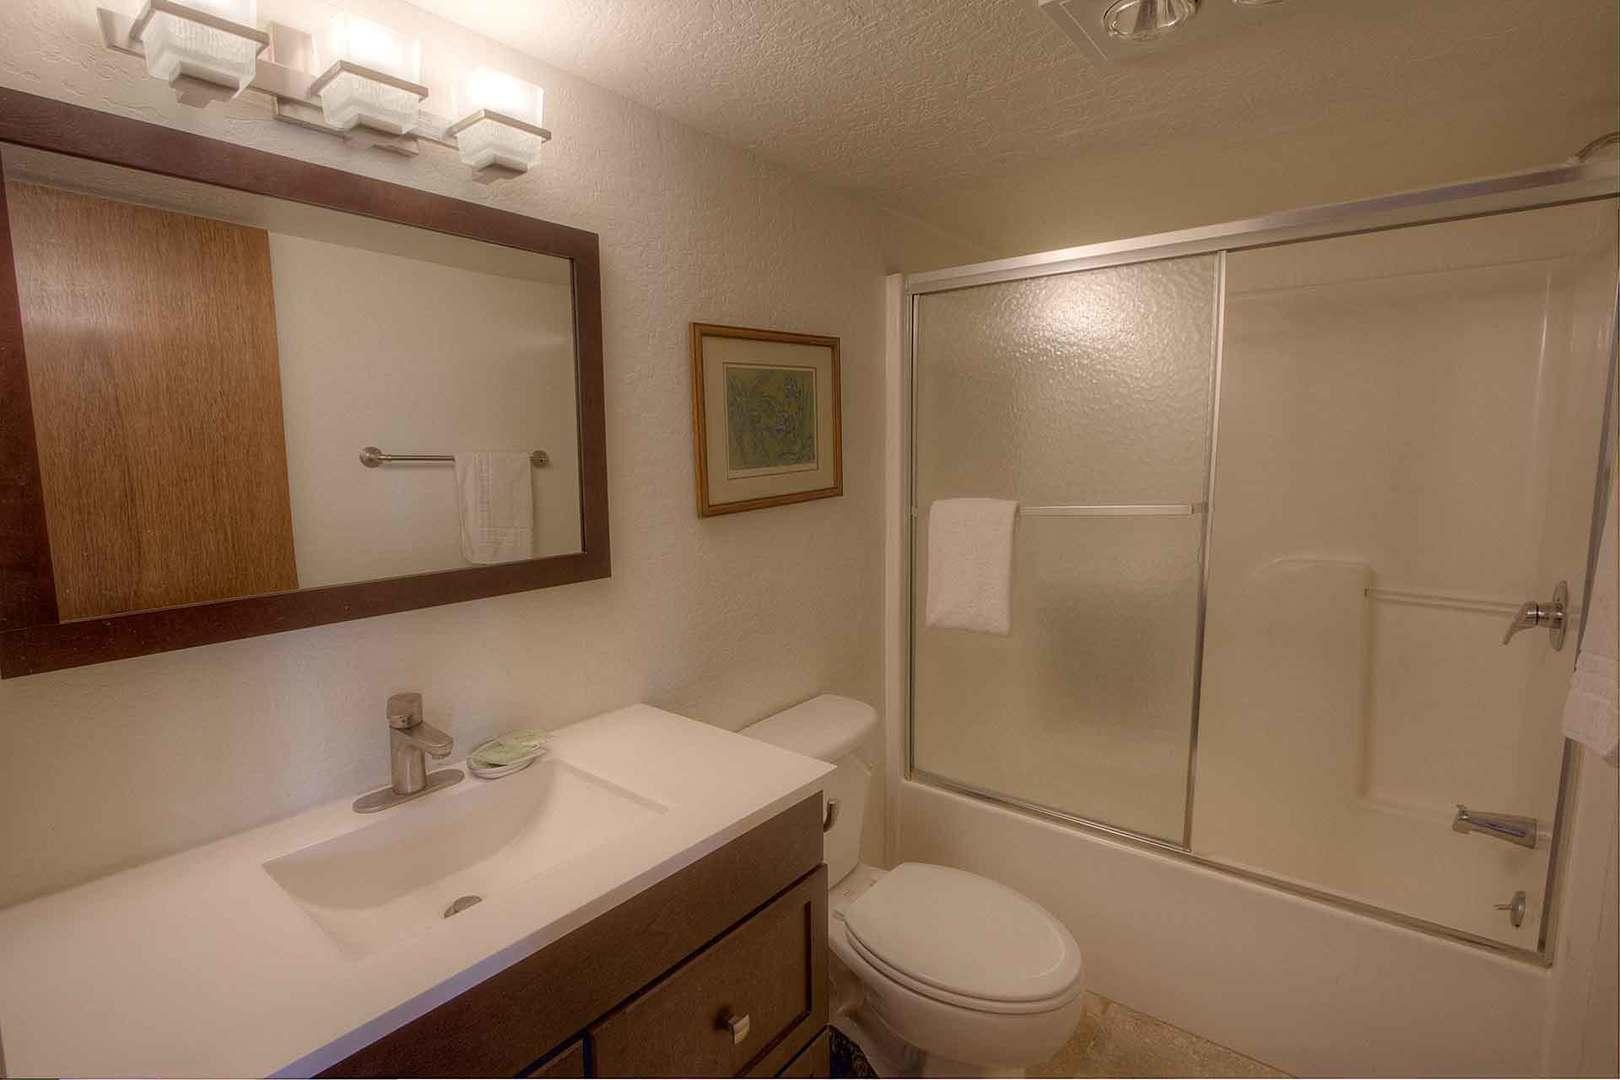 hnc0804 bathroom